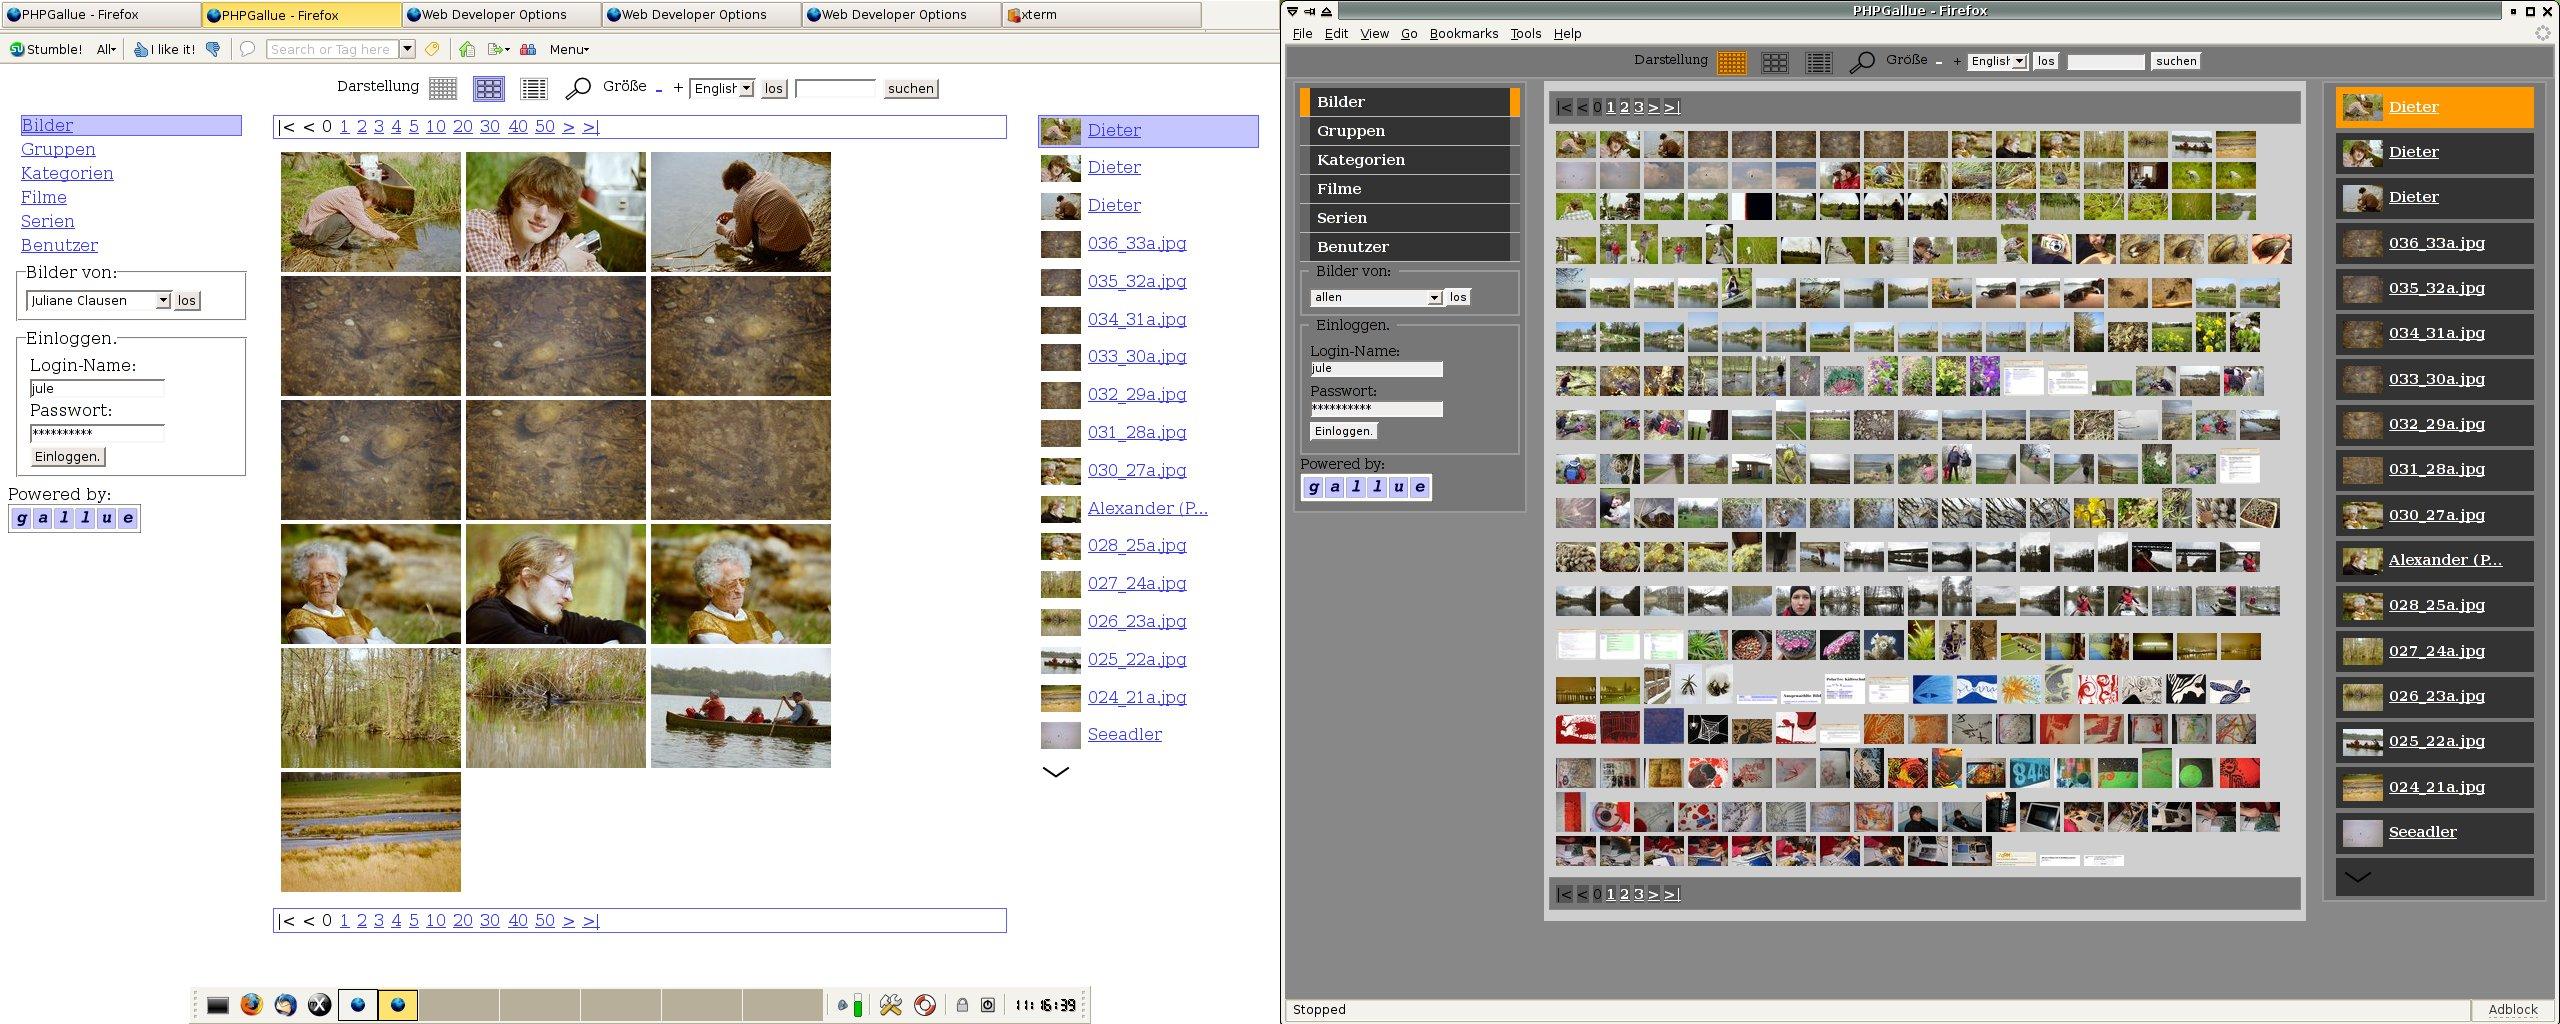 PHPGallue Screenshot